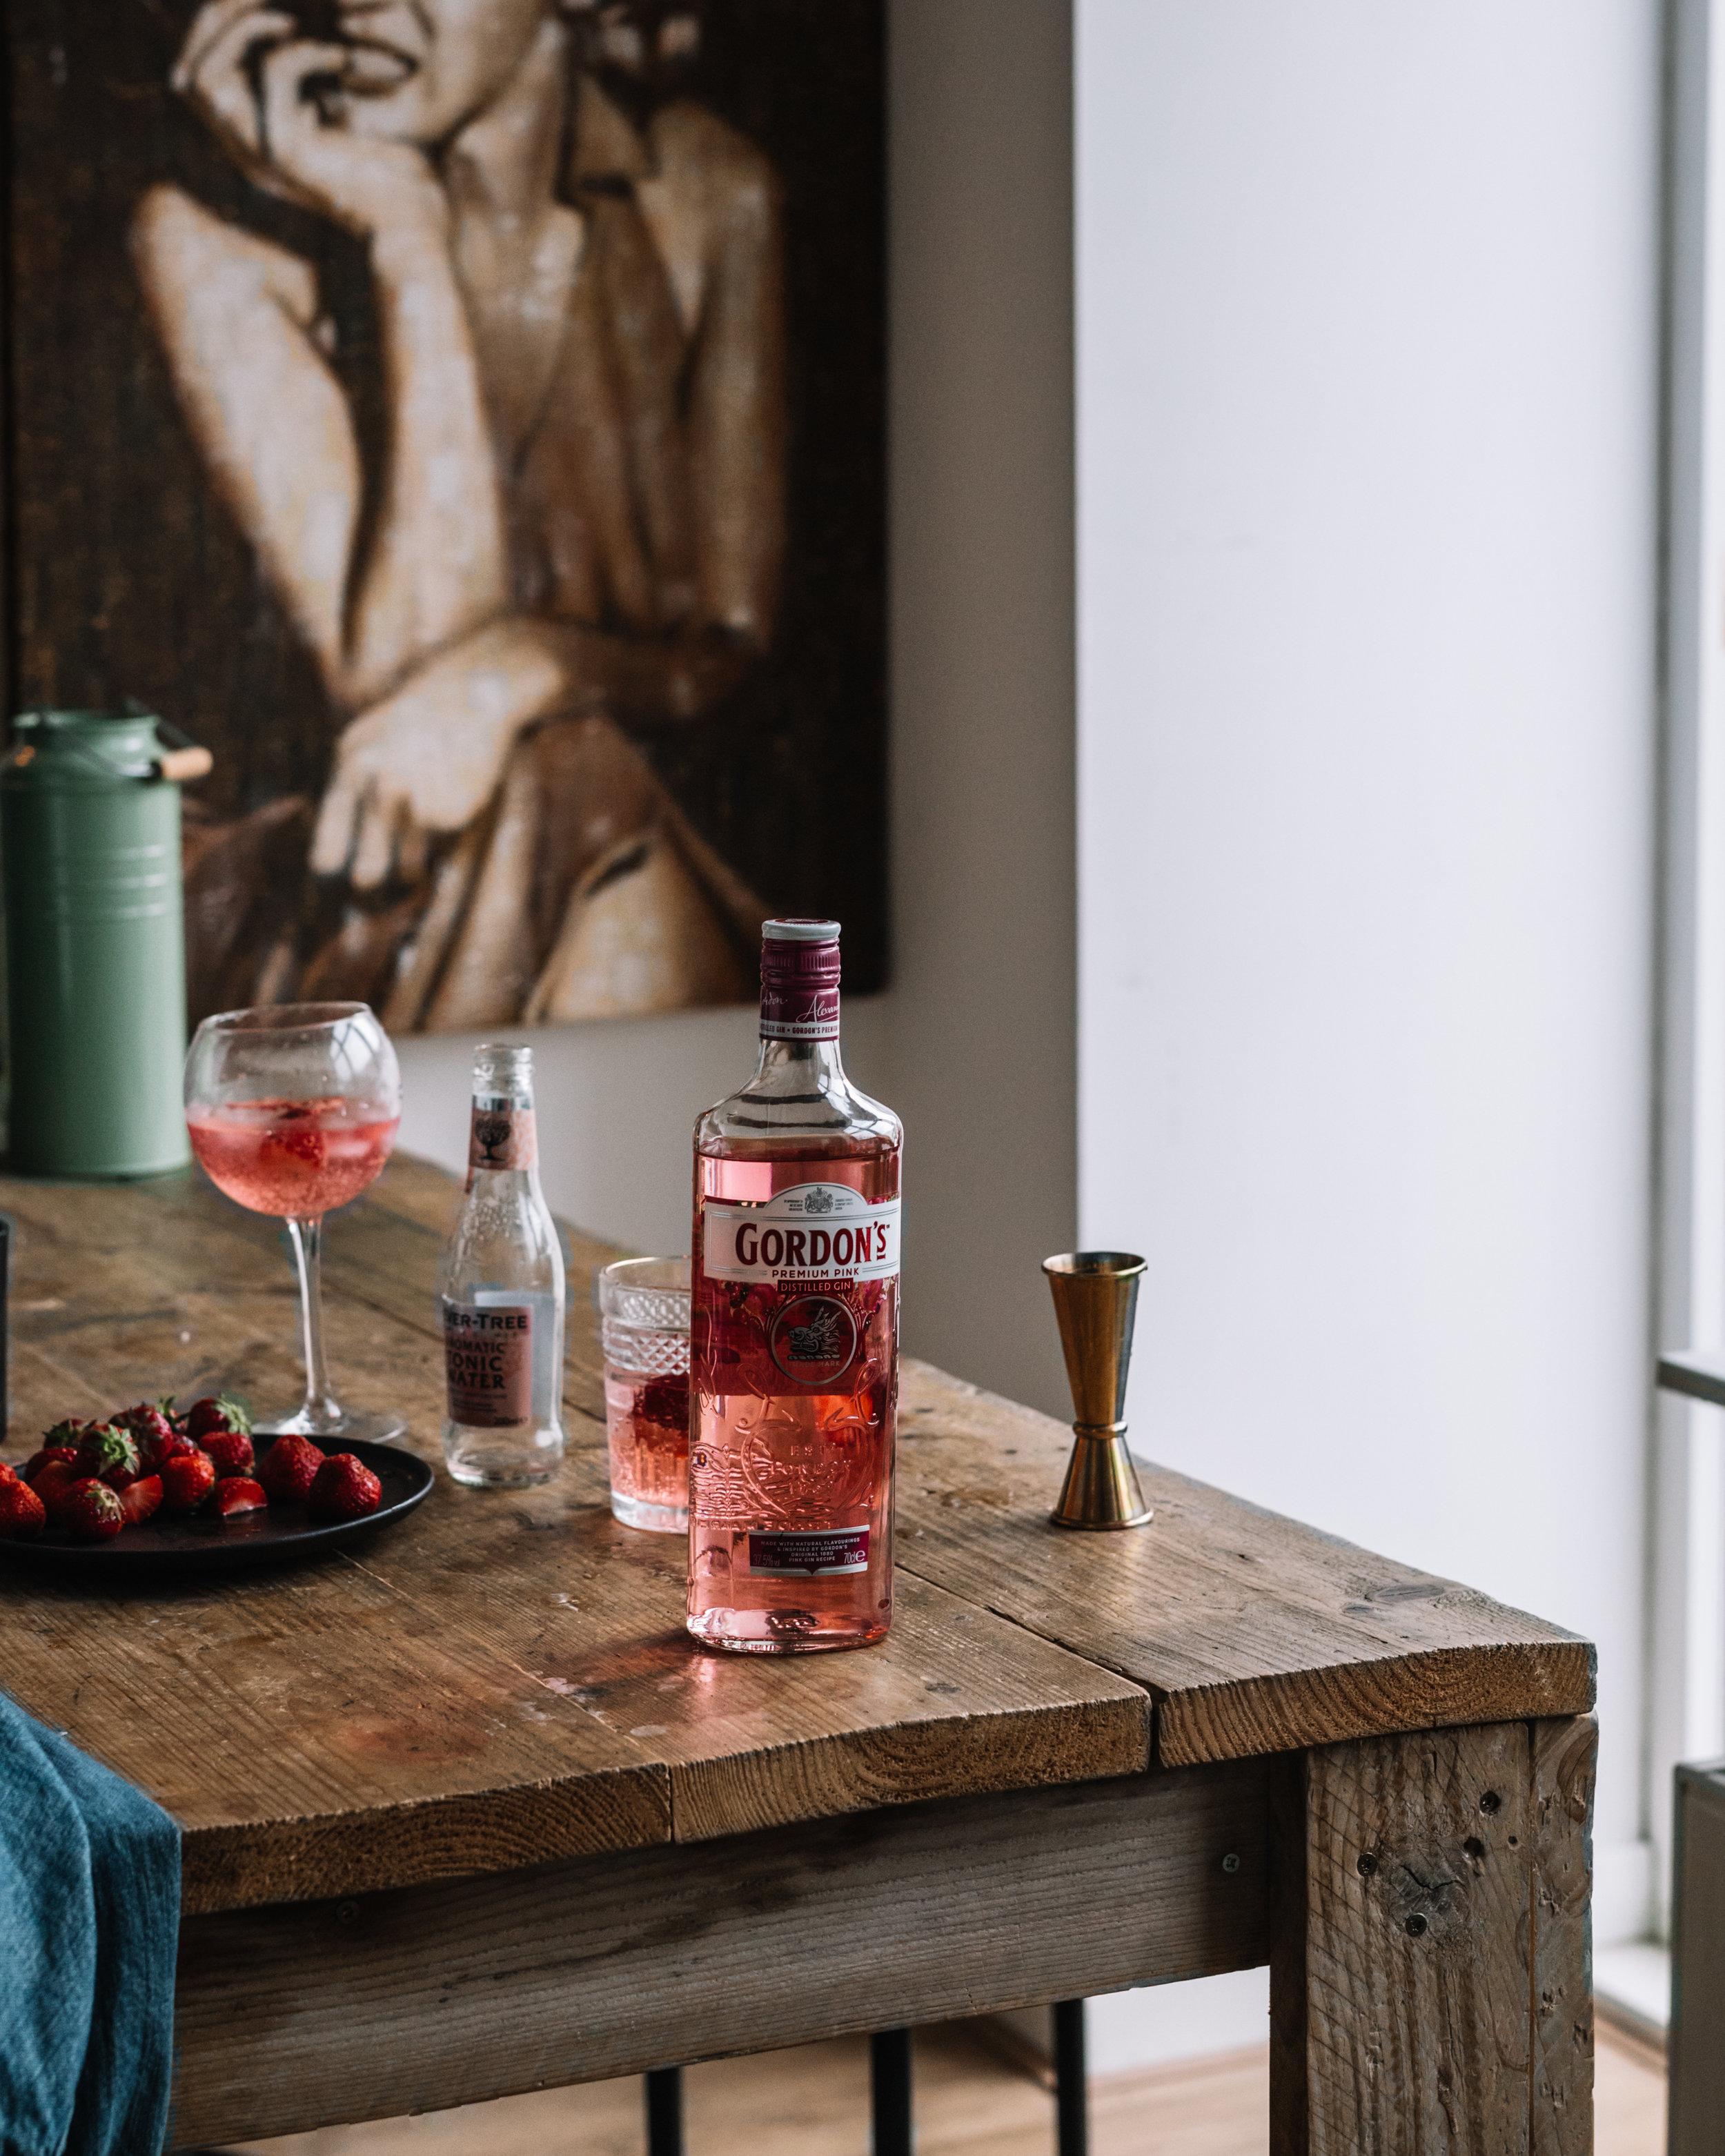 #Letscocktail Gordons Pink Gin 20183.jpg